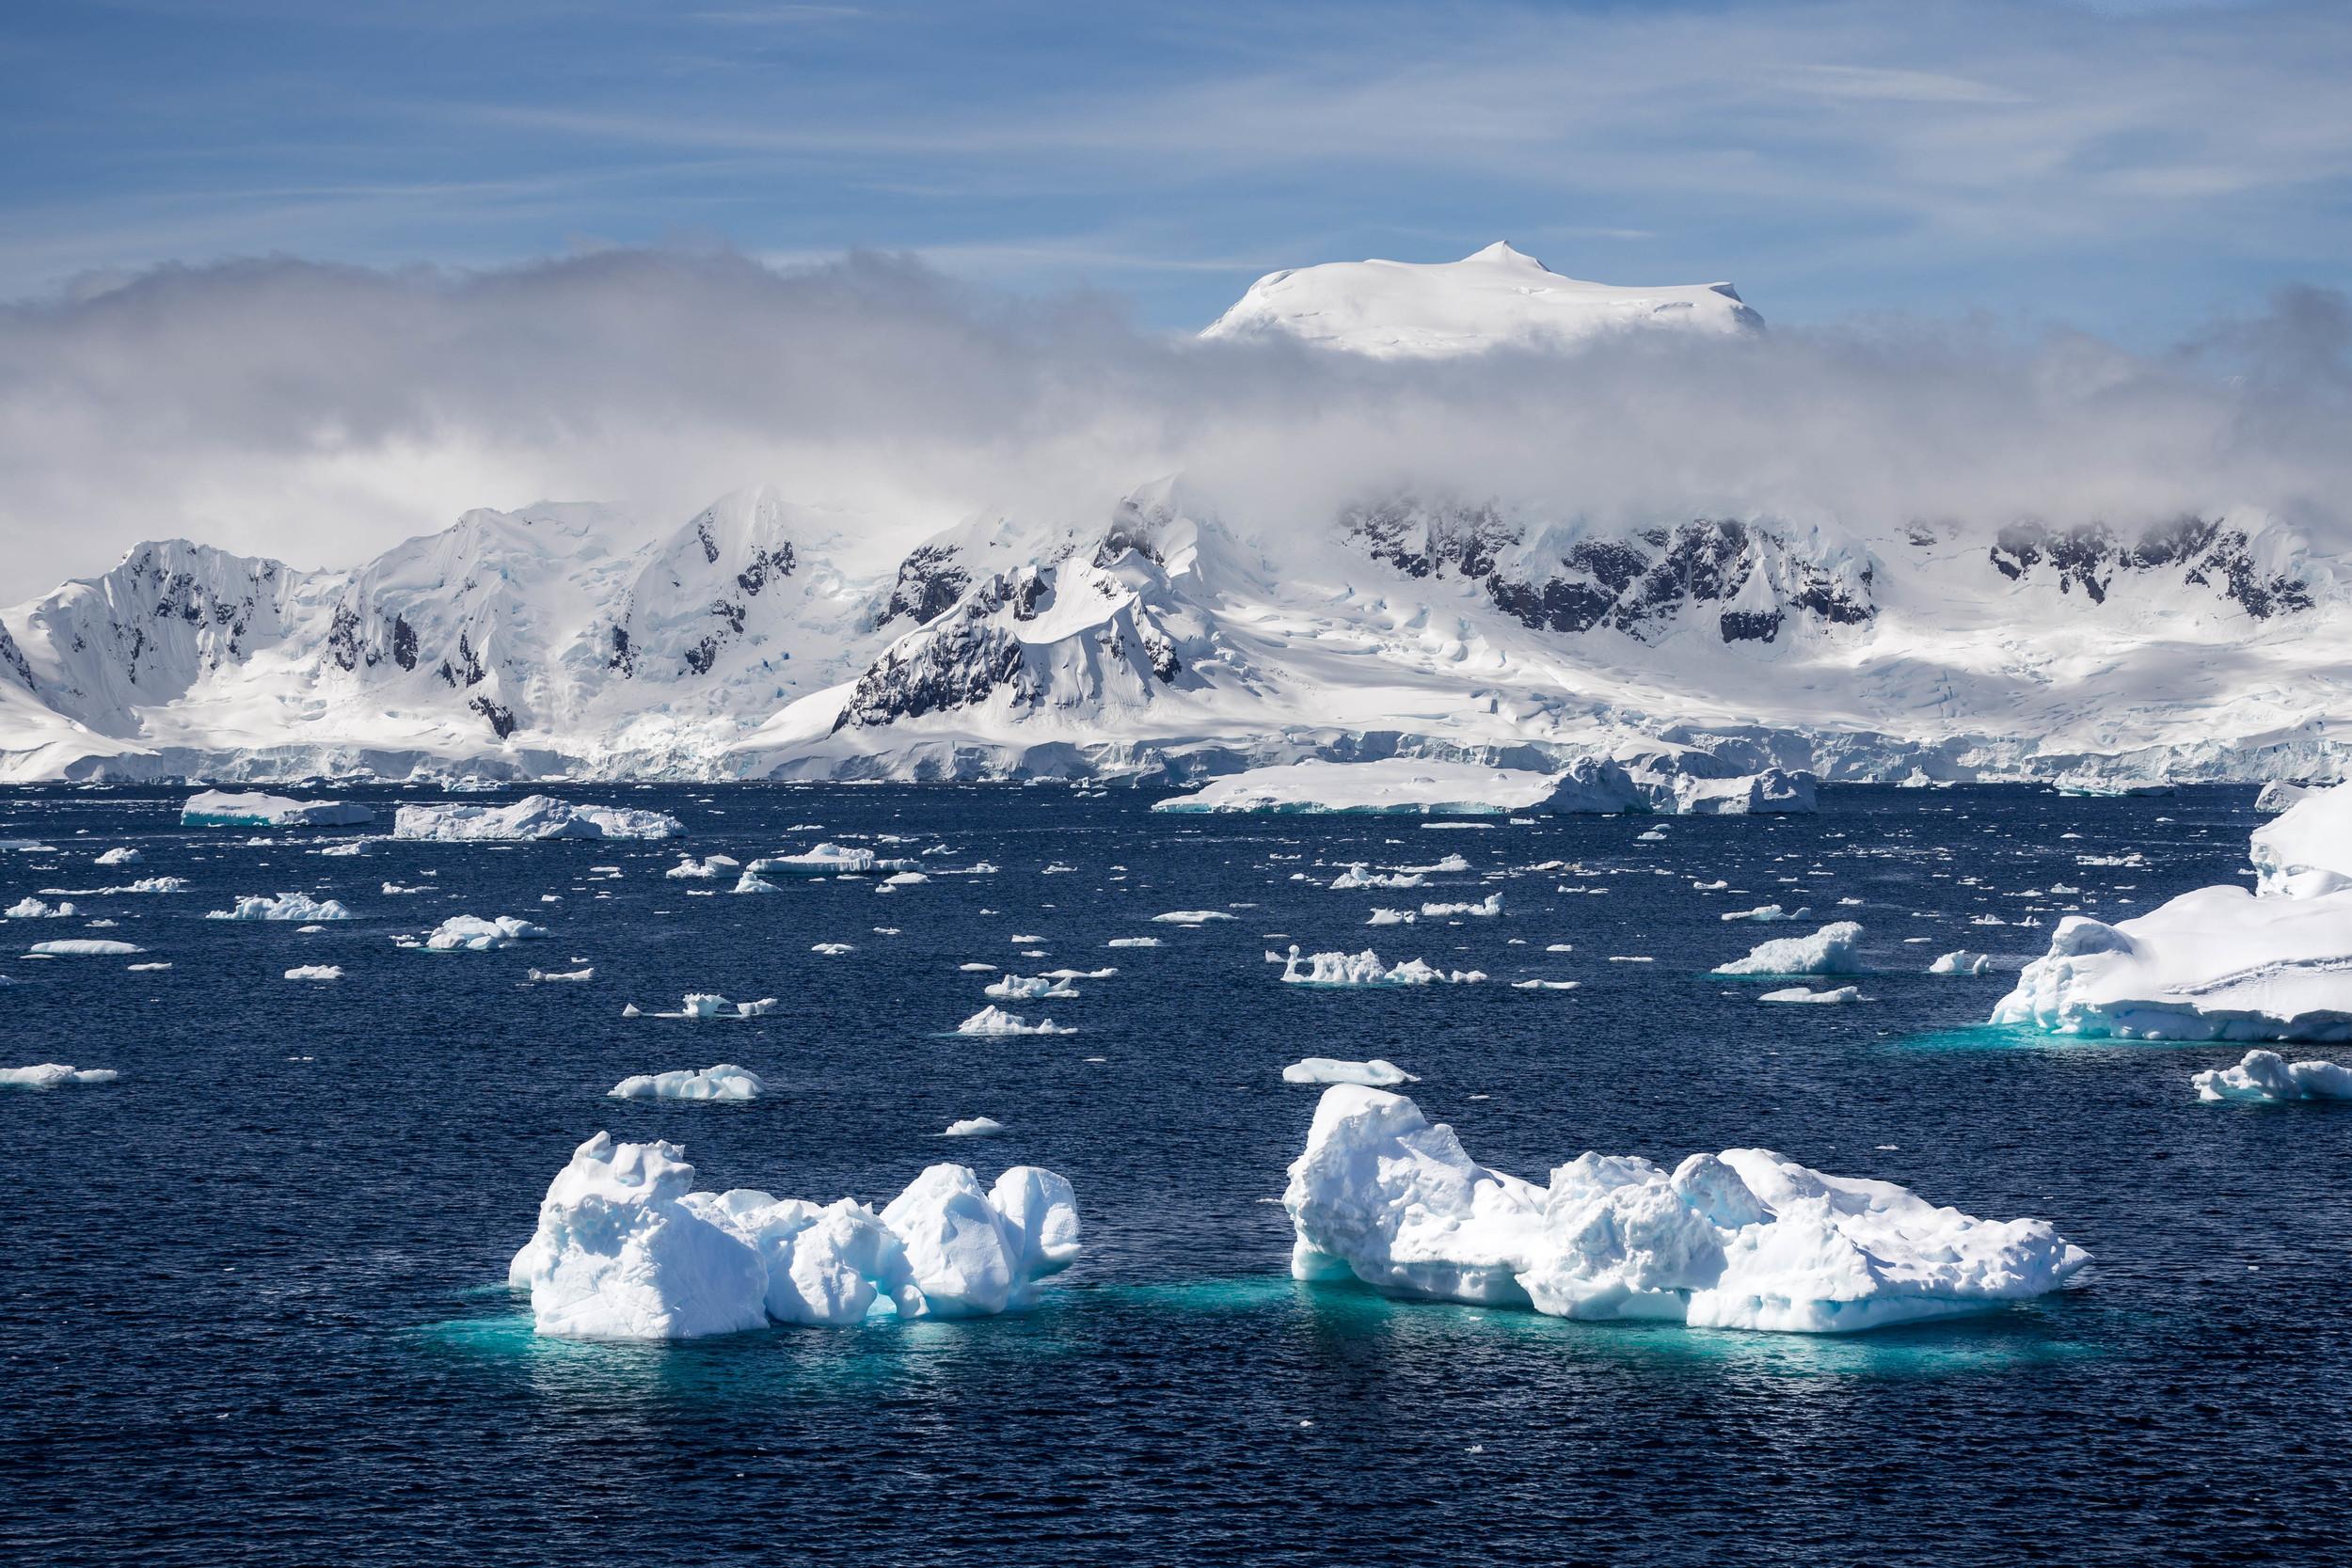 ApproachingCharlotte Bay, Antarctica. The stuff of dreams.